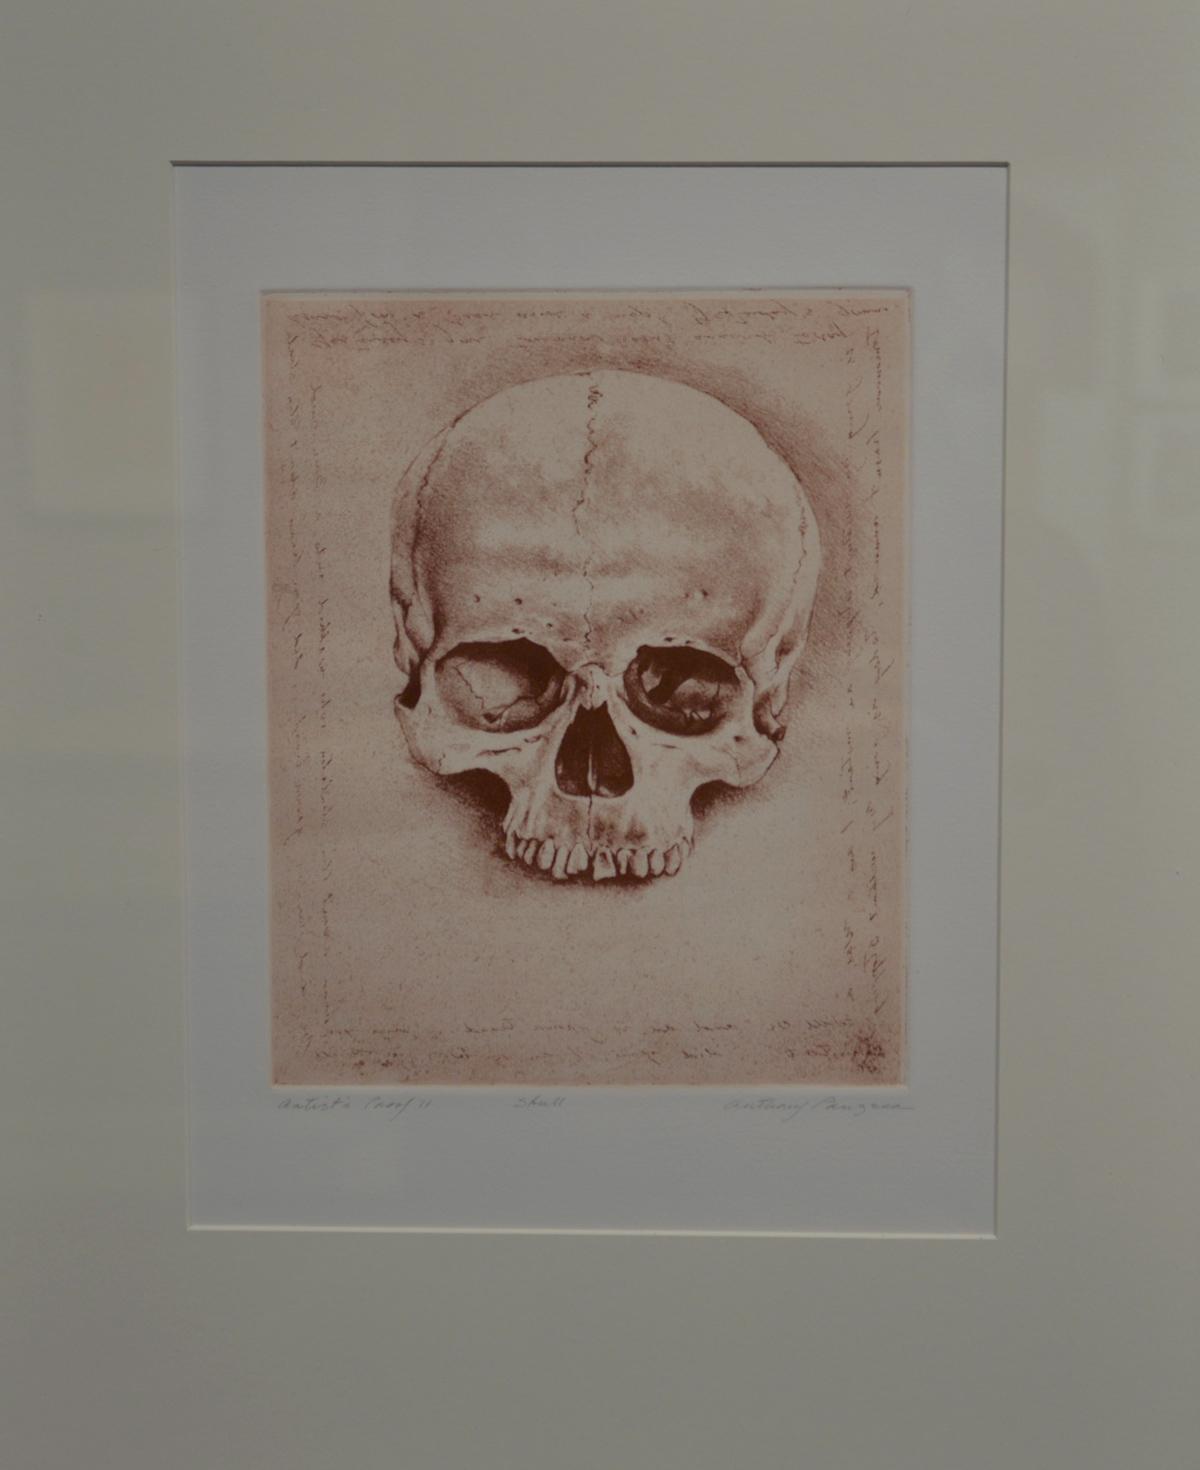 Panzera, Anthony - Skull